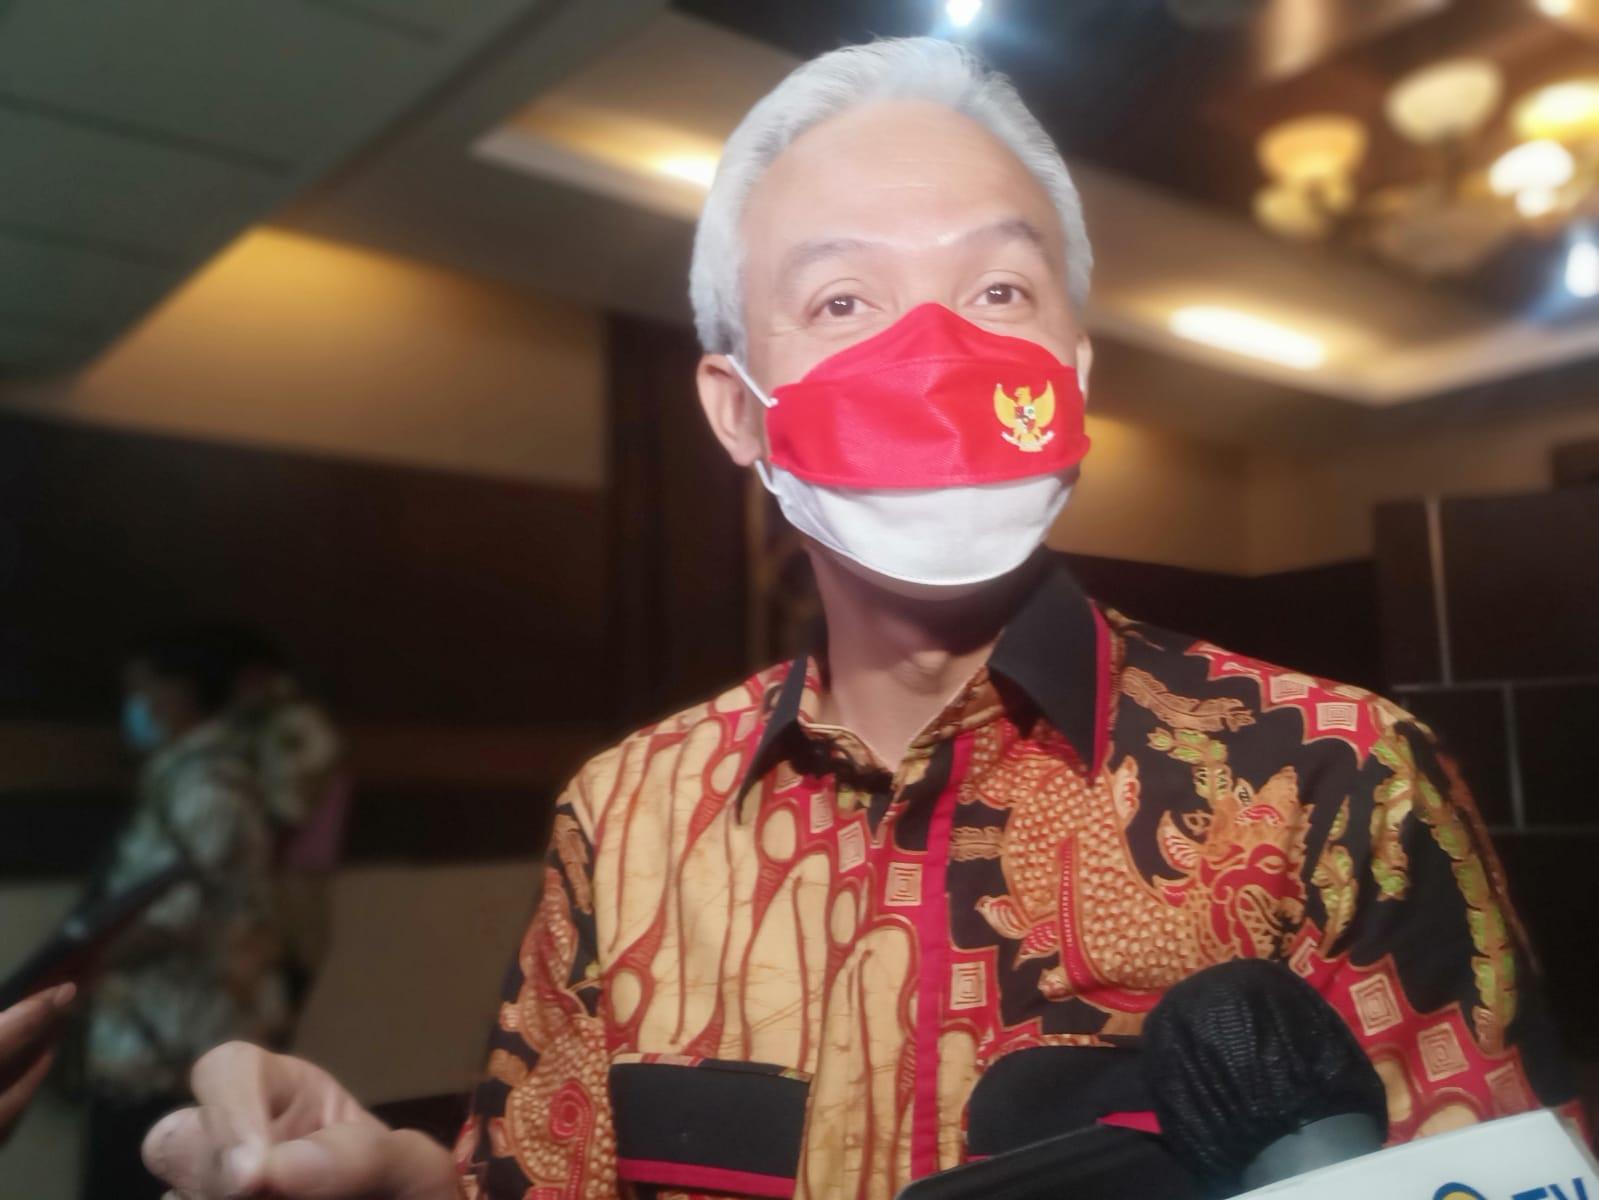 Gubernur Jateng, Ganjar Pranowo, usai memimpin rapat penanganan kemiskinan ekstrem di Ruang Rapat Pemprov Jateng, Jumat (8/10/2021). FOTO: Rezanda Akbar D/Lingkar.co